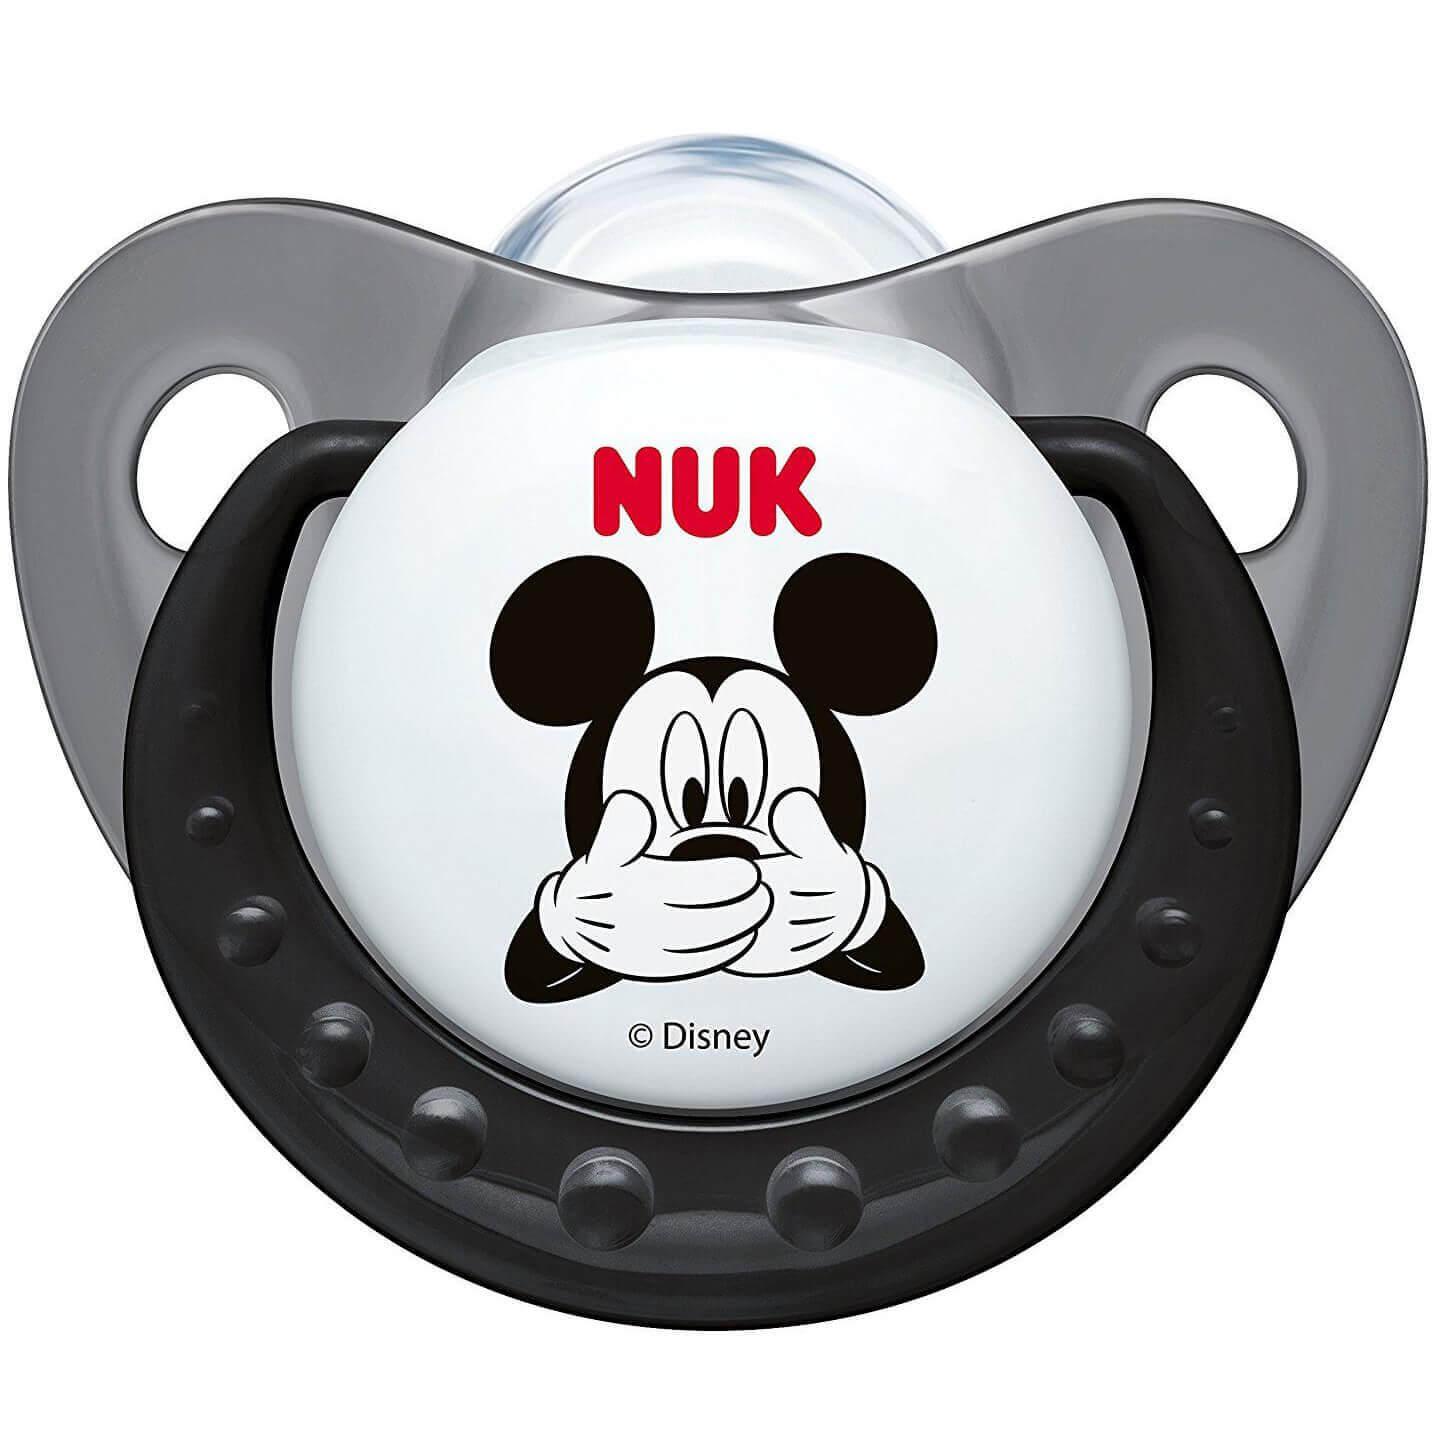 NUK Trendline Disney Mickey Πιπίλα Γκρι Σιλικόνης 6-18m 1 τεμάχιο